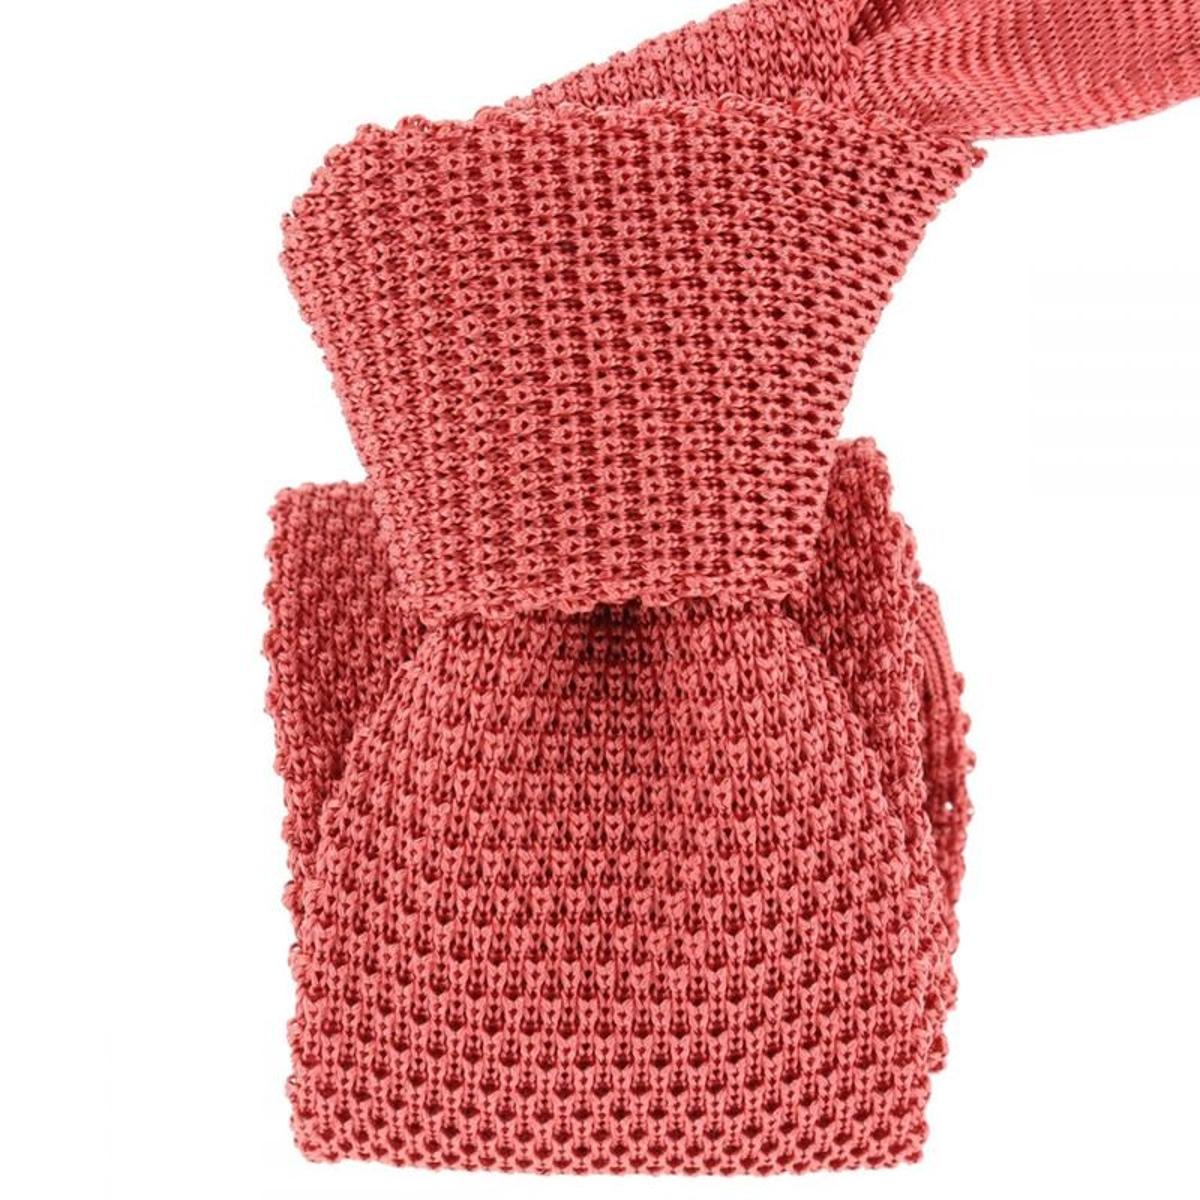 Cravate tricot Intemporelle. Soie Uni